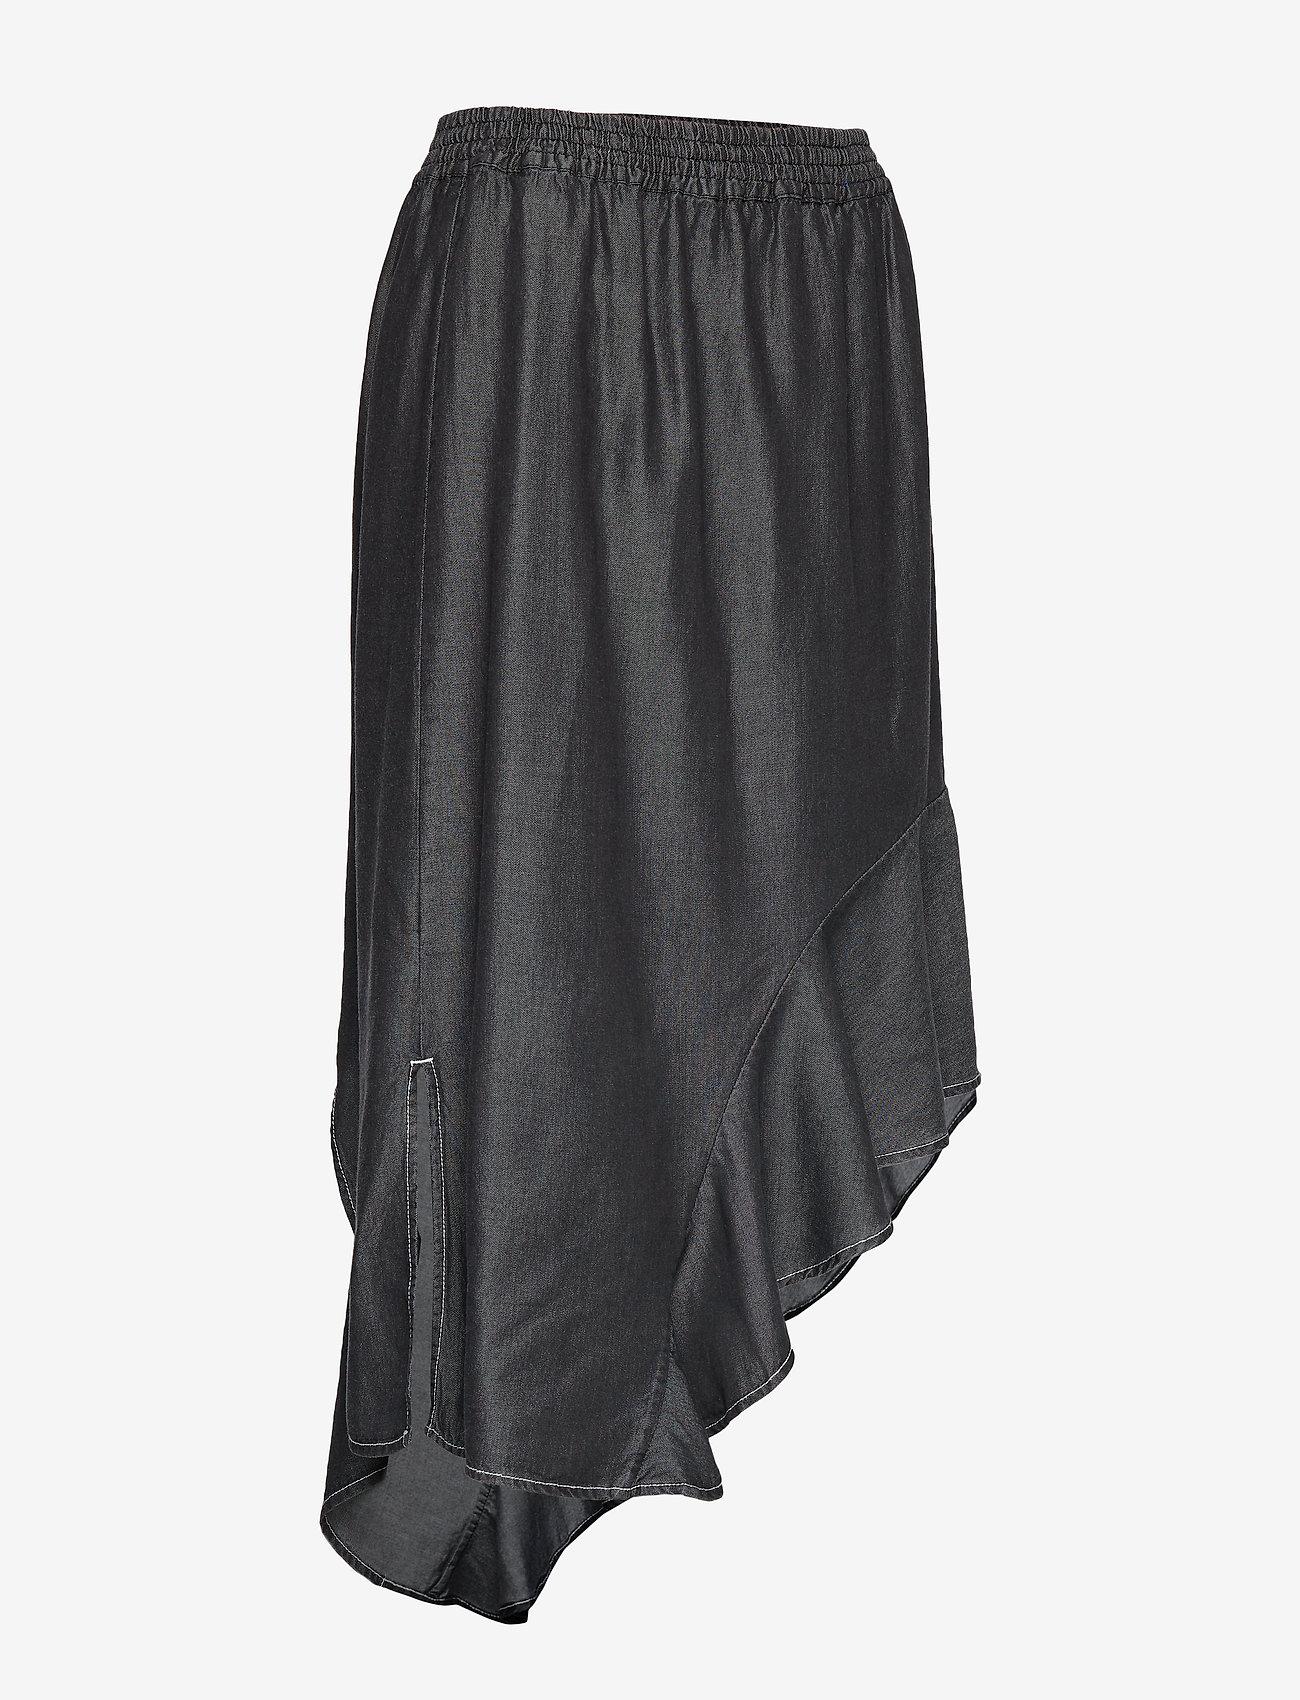 Polly Skirt (Black Denim) (666 kr) - DESIGNERS, REMIX